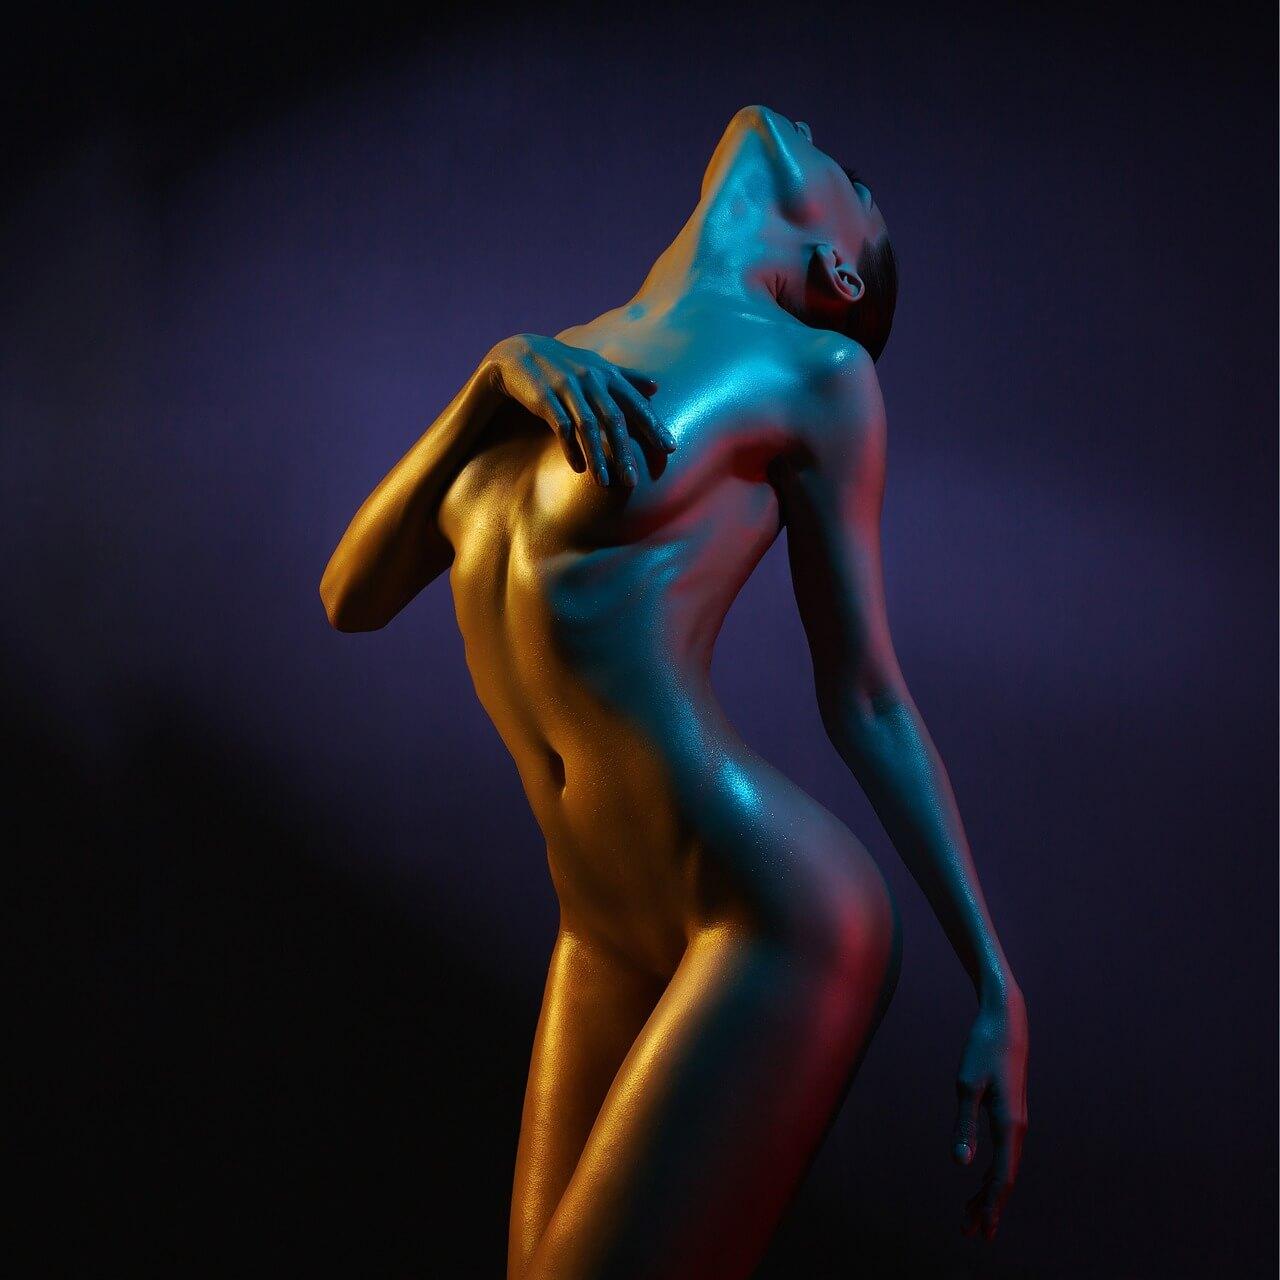 nudo-artistico